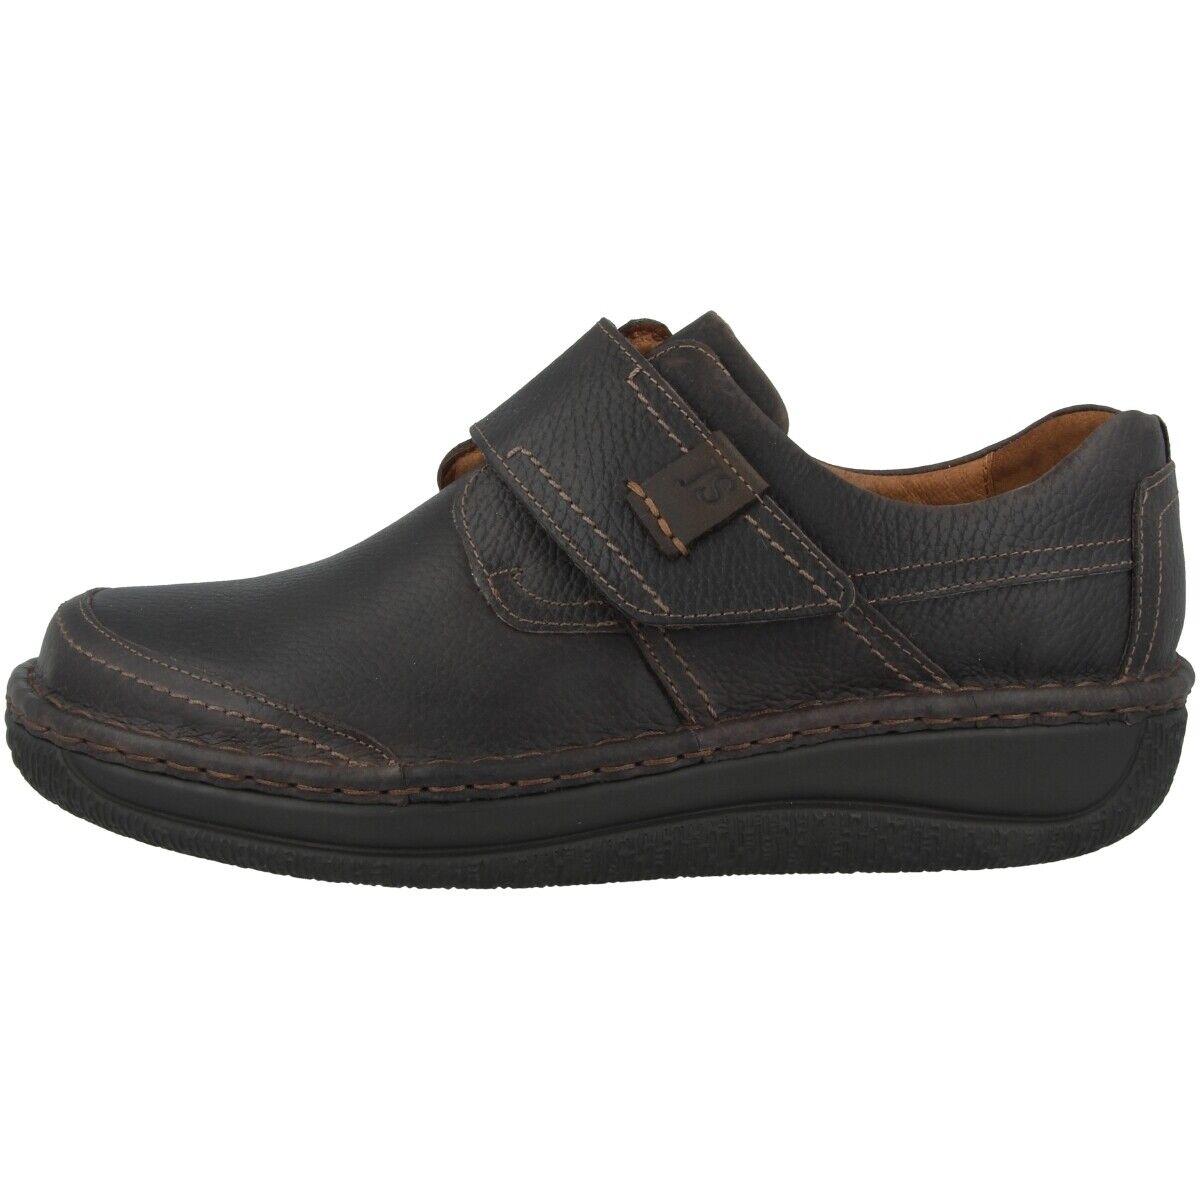 Josef Seibel Garrett 05 zapatos Men señores zapato bajo velcro zapatos 44436-781-330